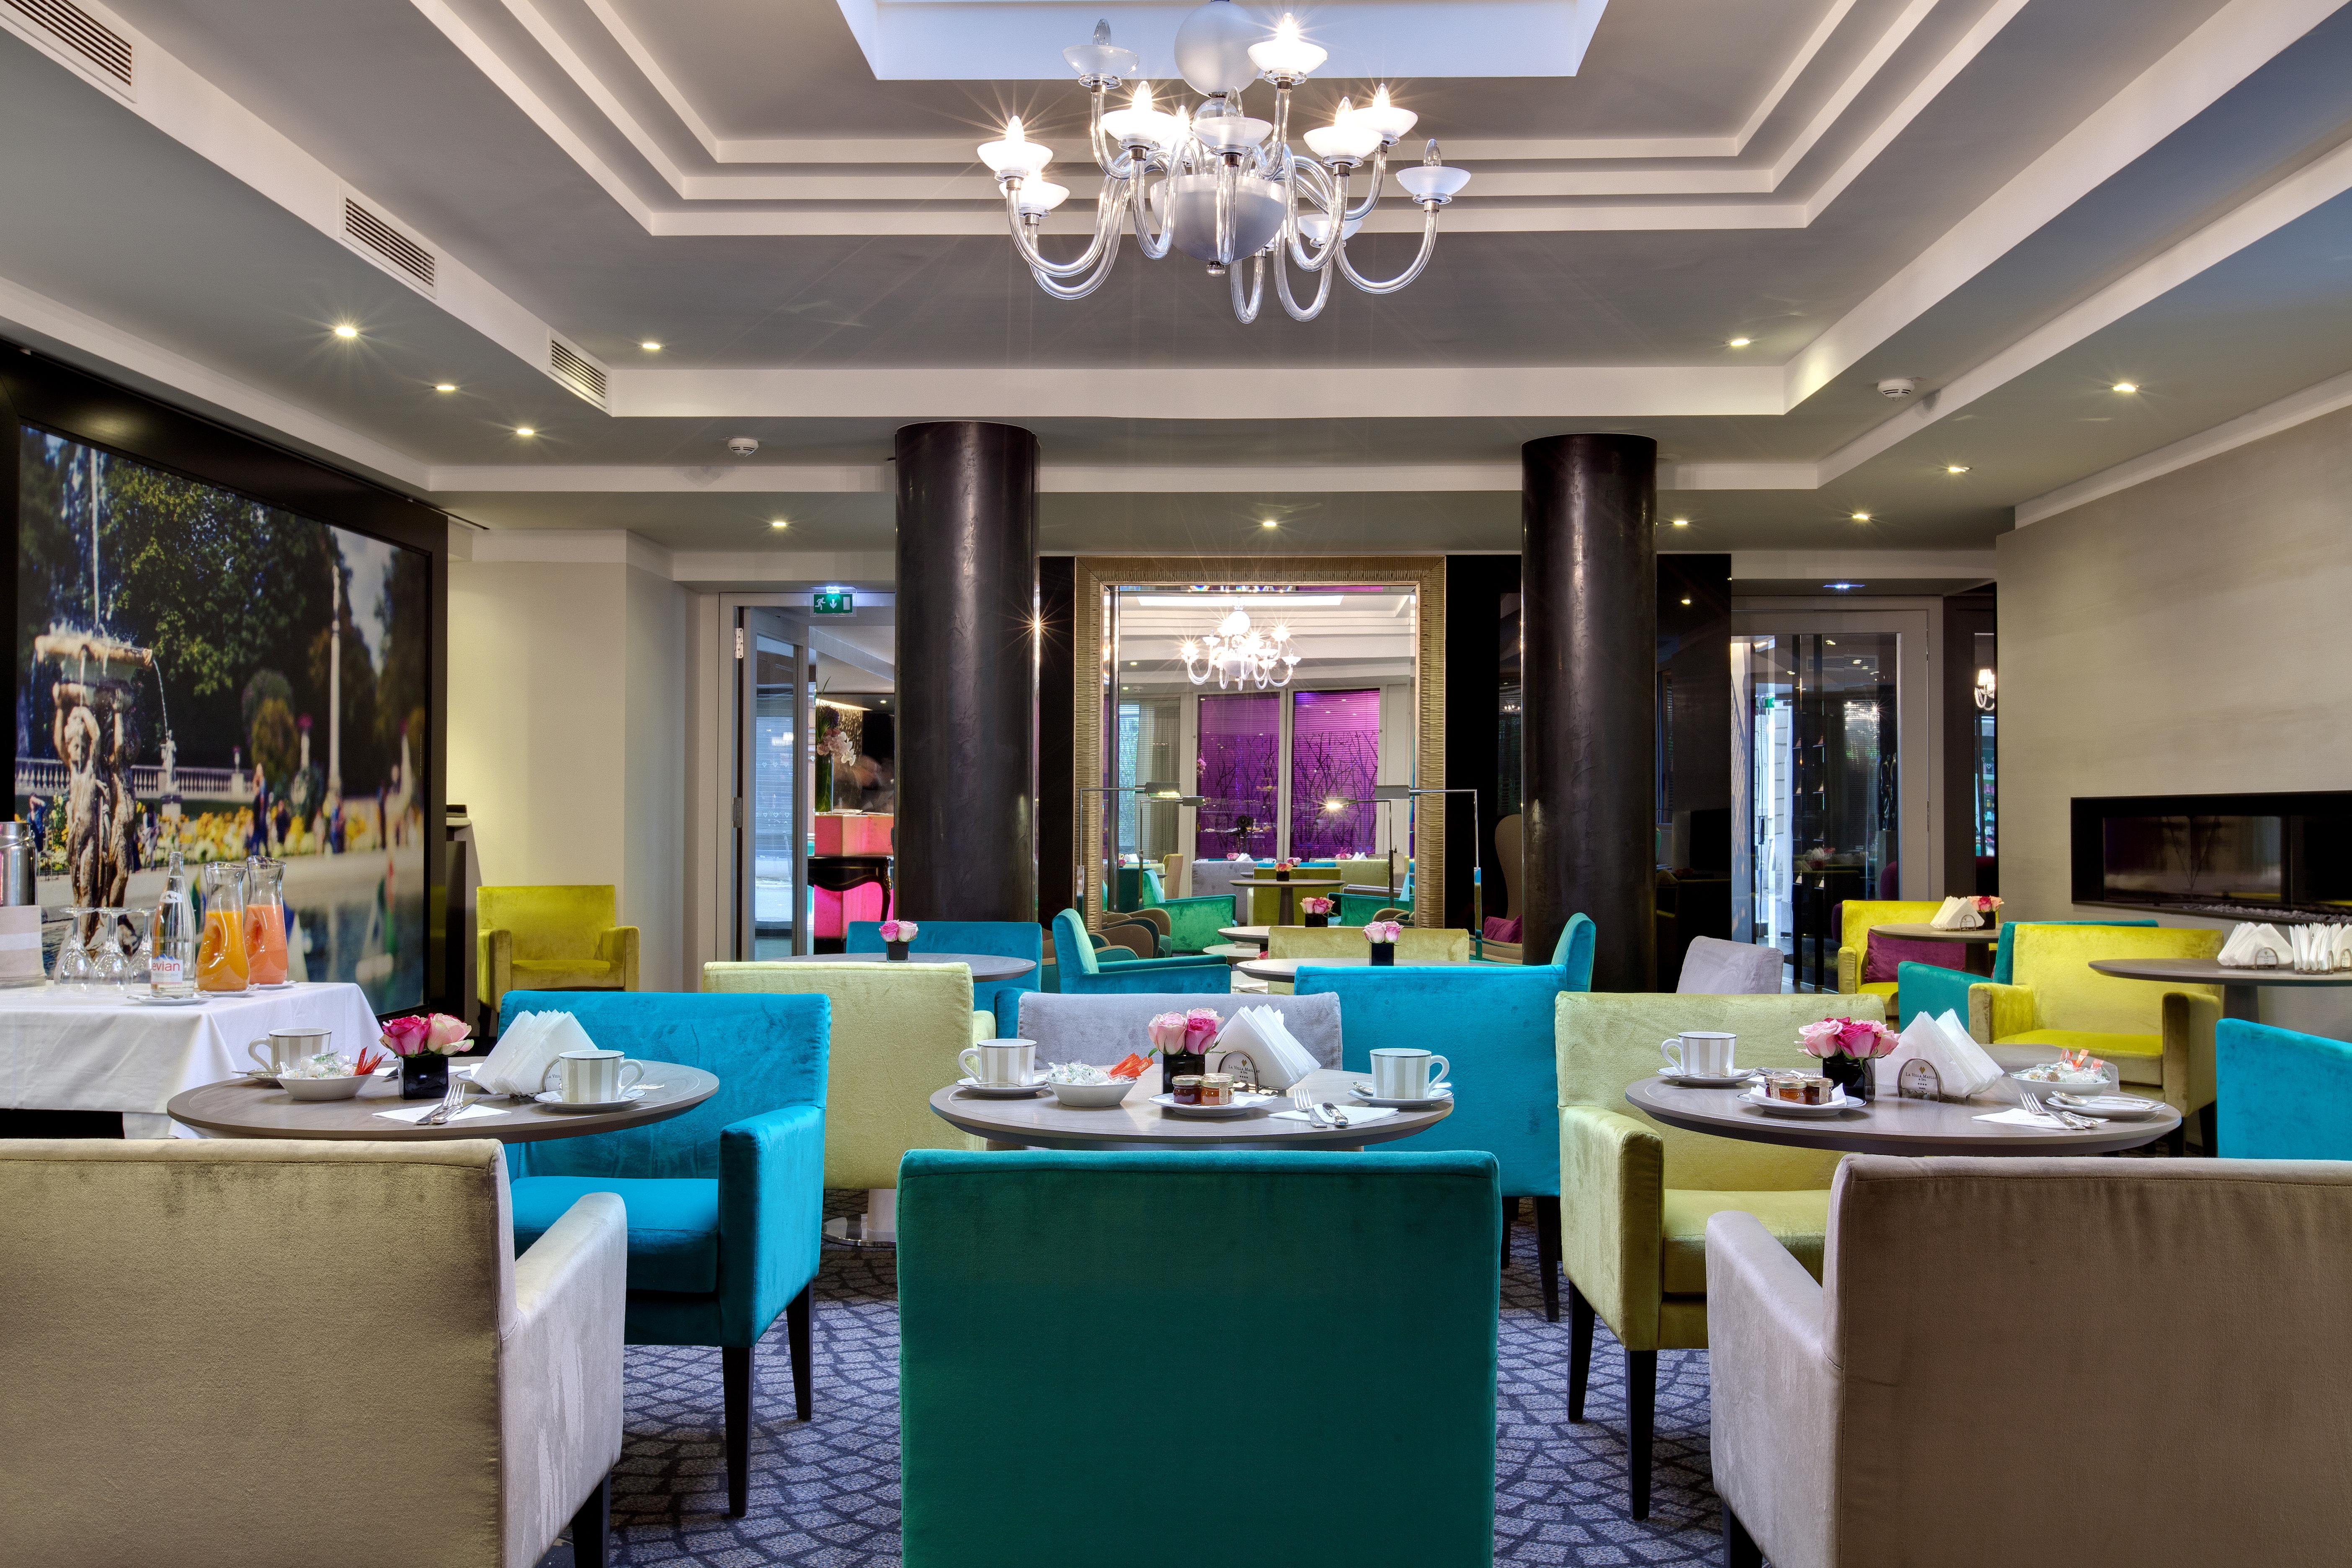 Salon bar le v la villa maillot spa paris luxsure for Salon spa paris